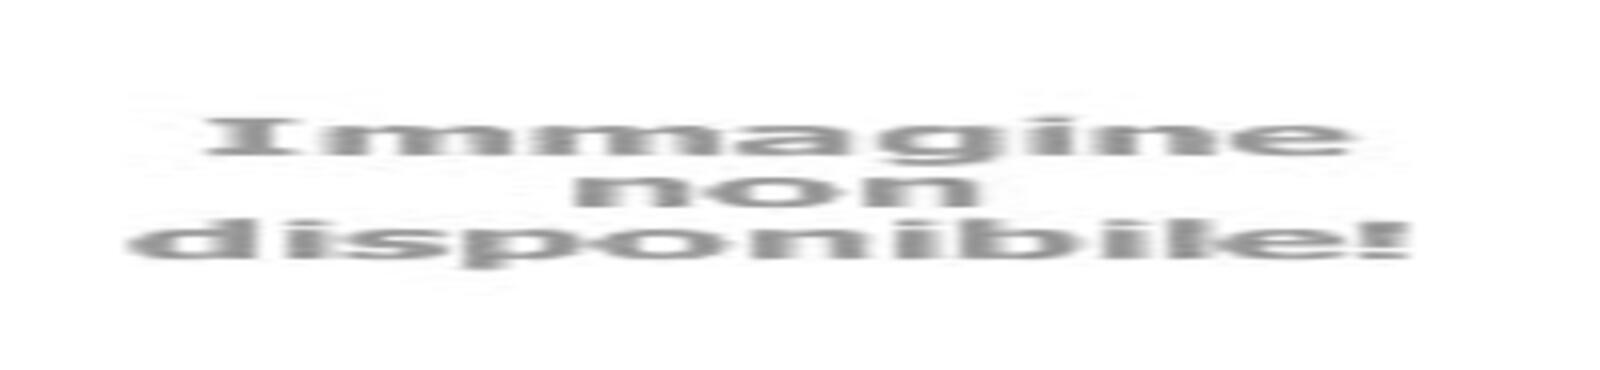 petronianaviaggi it parco-giardino-sigurta-nel-momento-del-foliage-v348 002